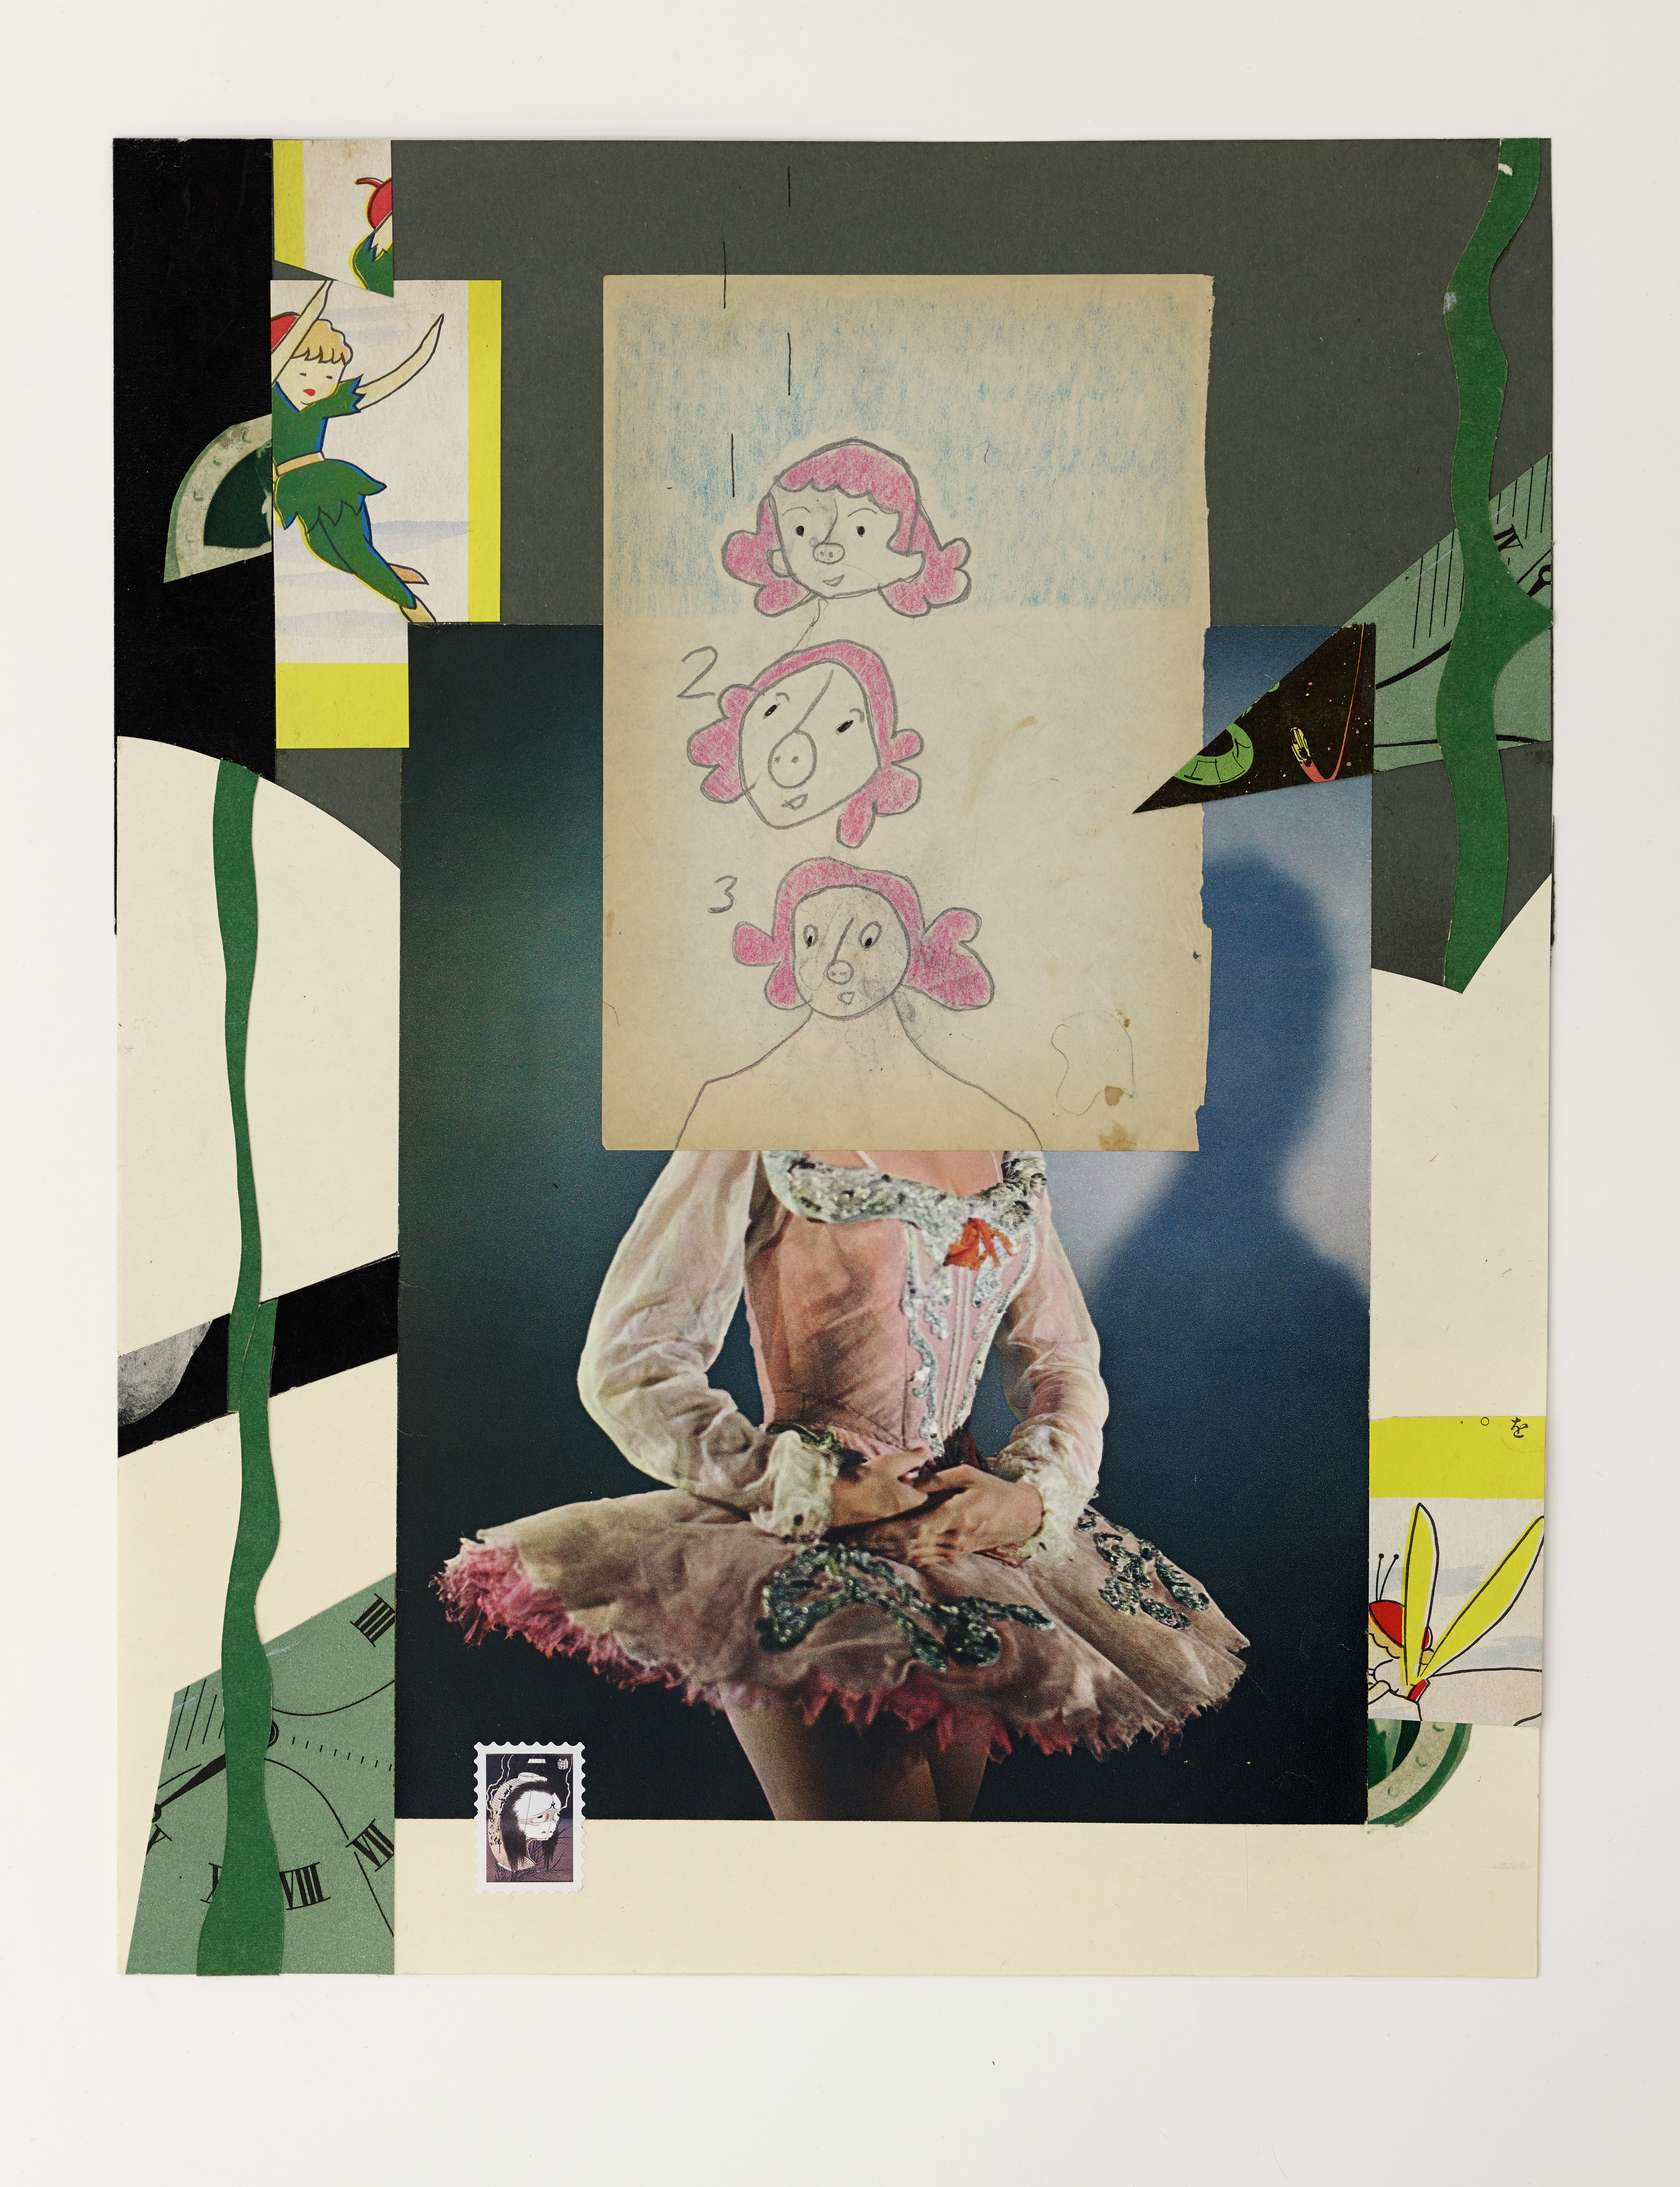 Hippolyte Hentgen, Sanjo Dori, 2019 Collage sur papier44 × 34.5 cm / 17 3/8 × 13 5/8 in.